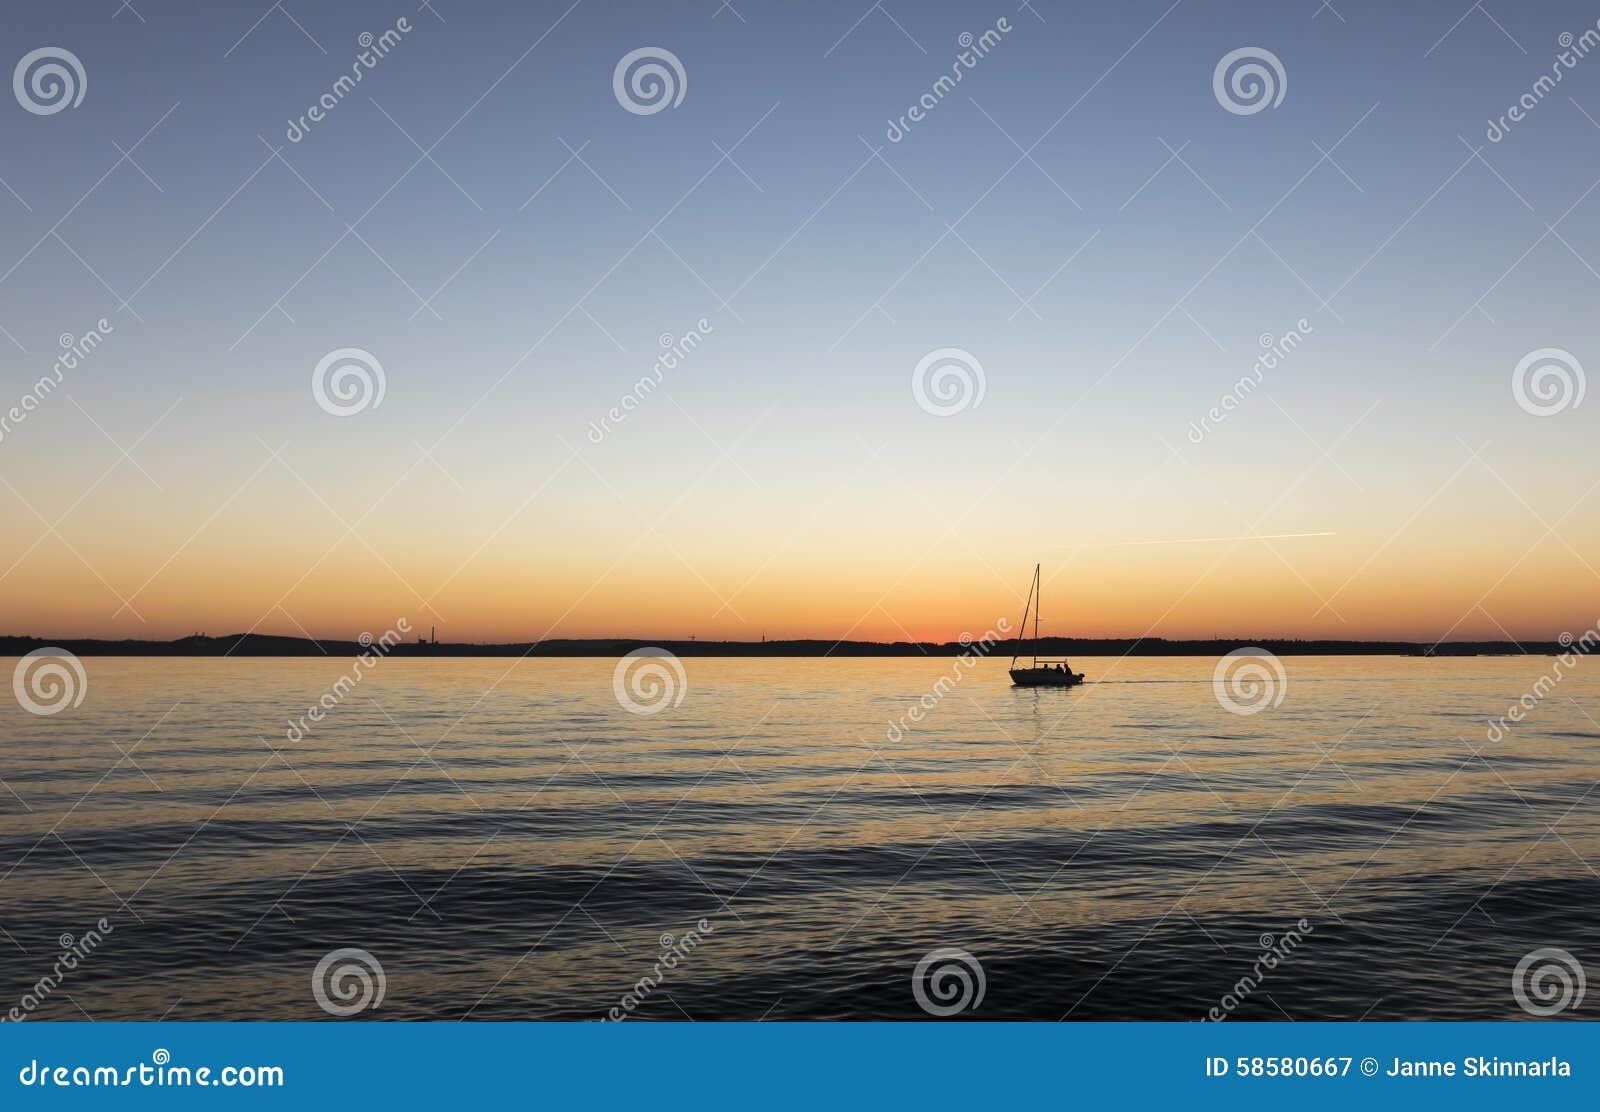 summer lake hispanic single men Welcoming str8 m/f couples/single women/single men: details: perverted piñata partylatin vibe by swinghearts white lake, ny: summer white party at the.